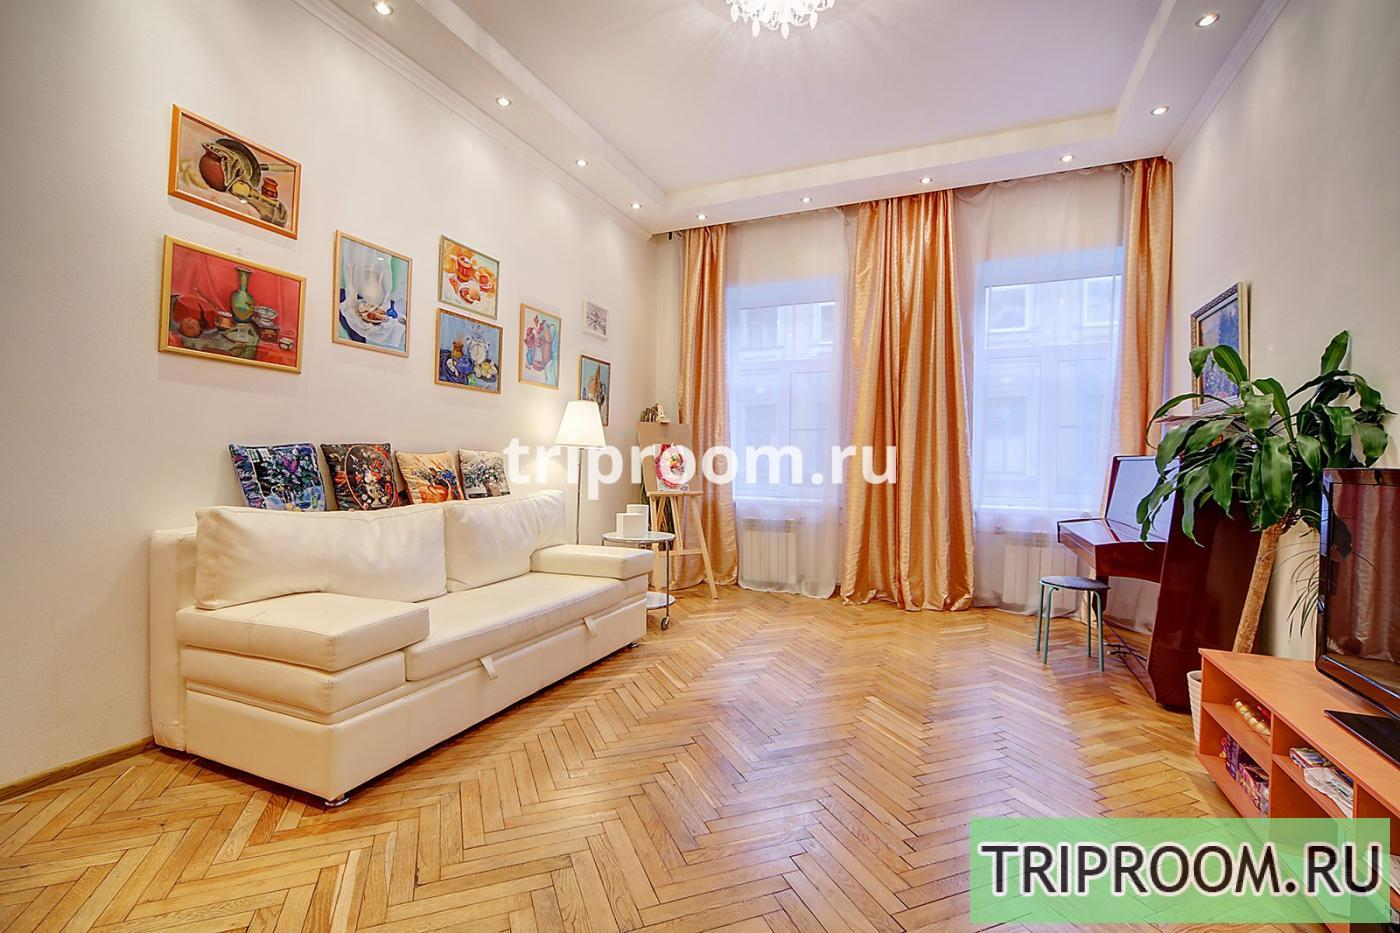 2-комнатная квартира посуточно (вариант № 15426), ул. Лиговский проспект, фото № 1